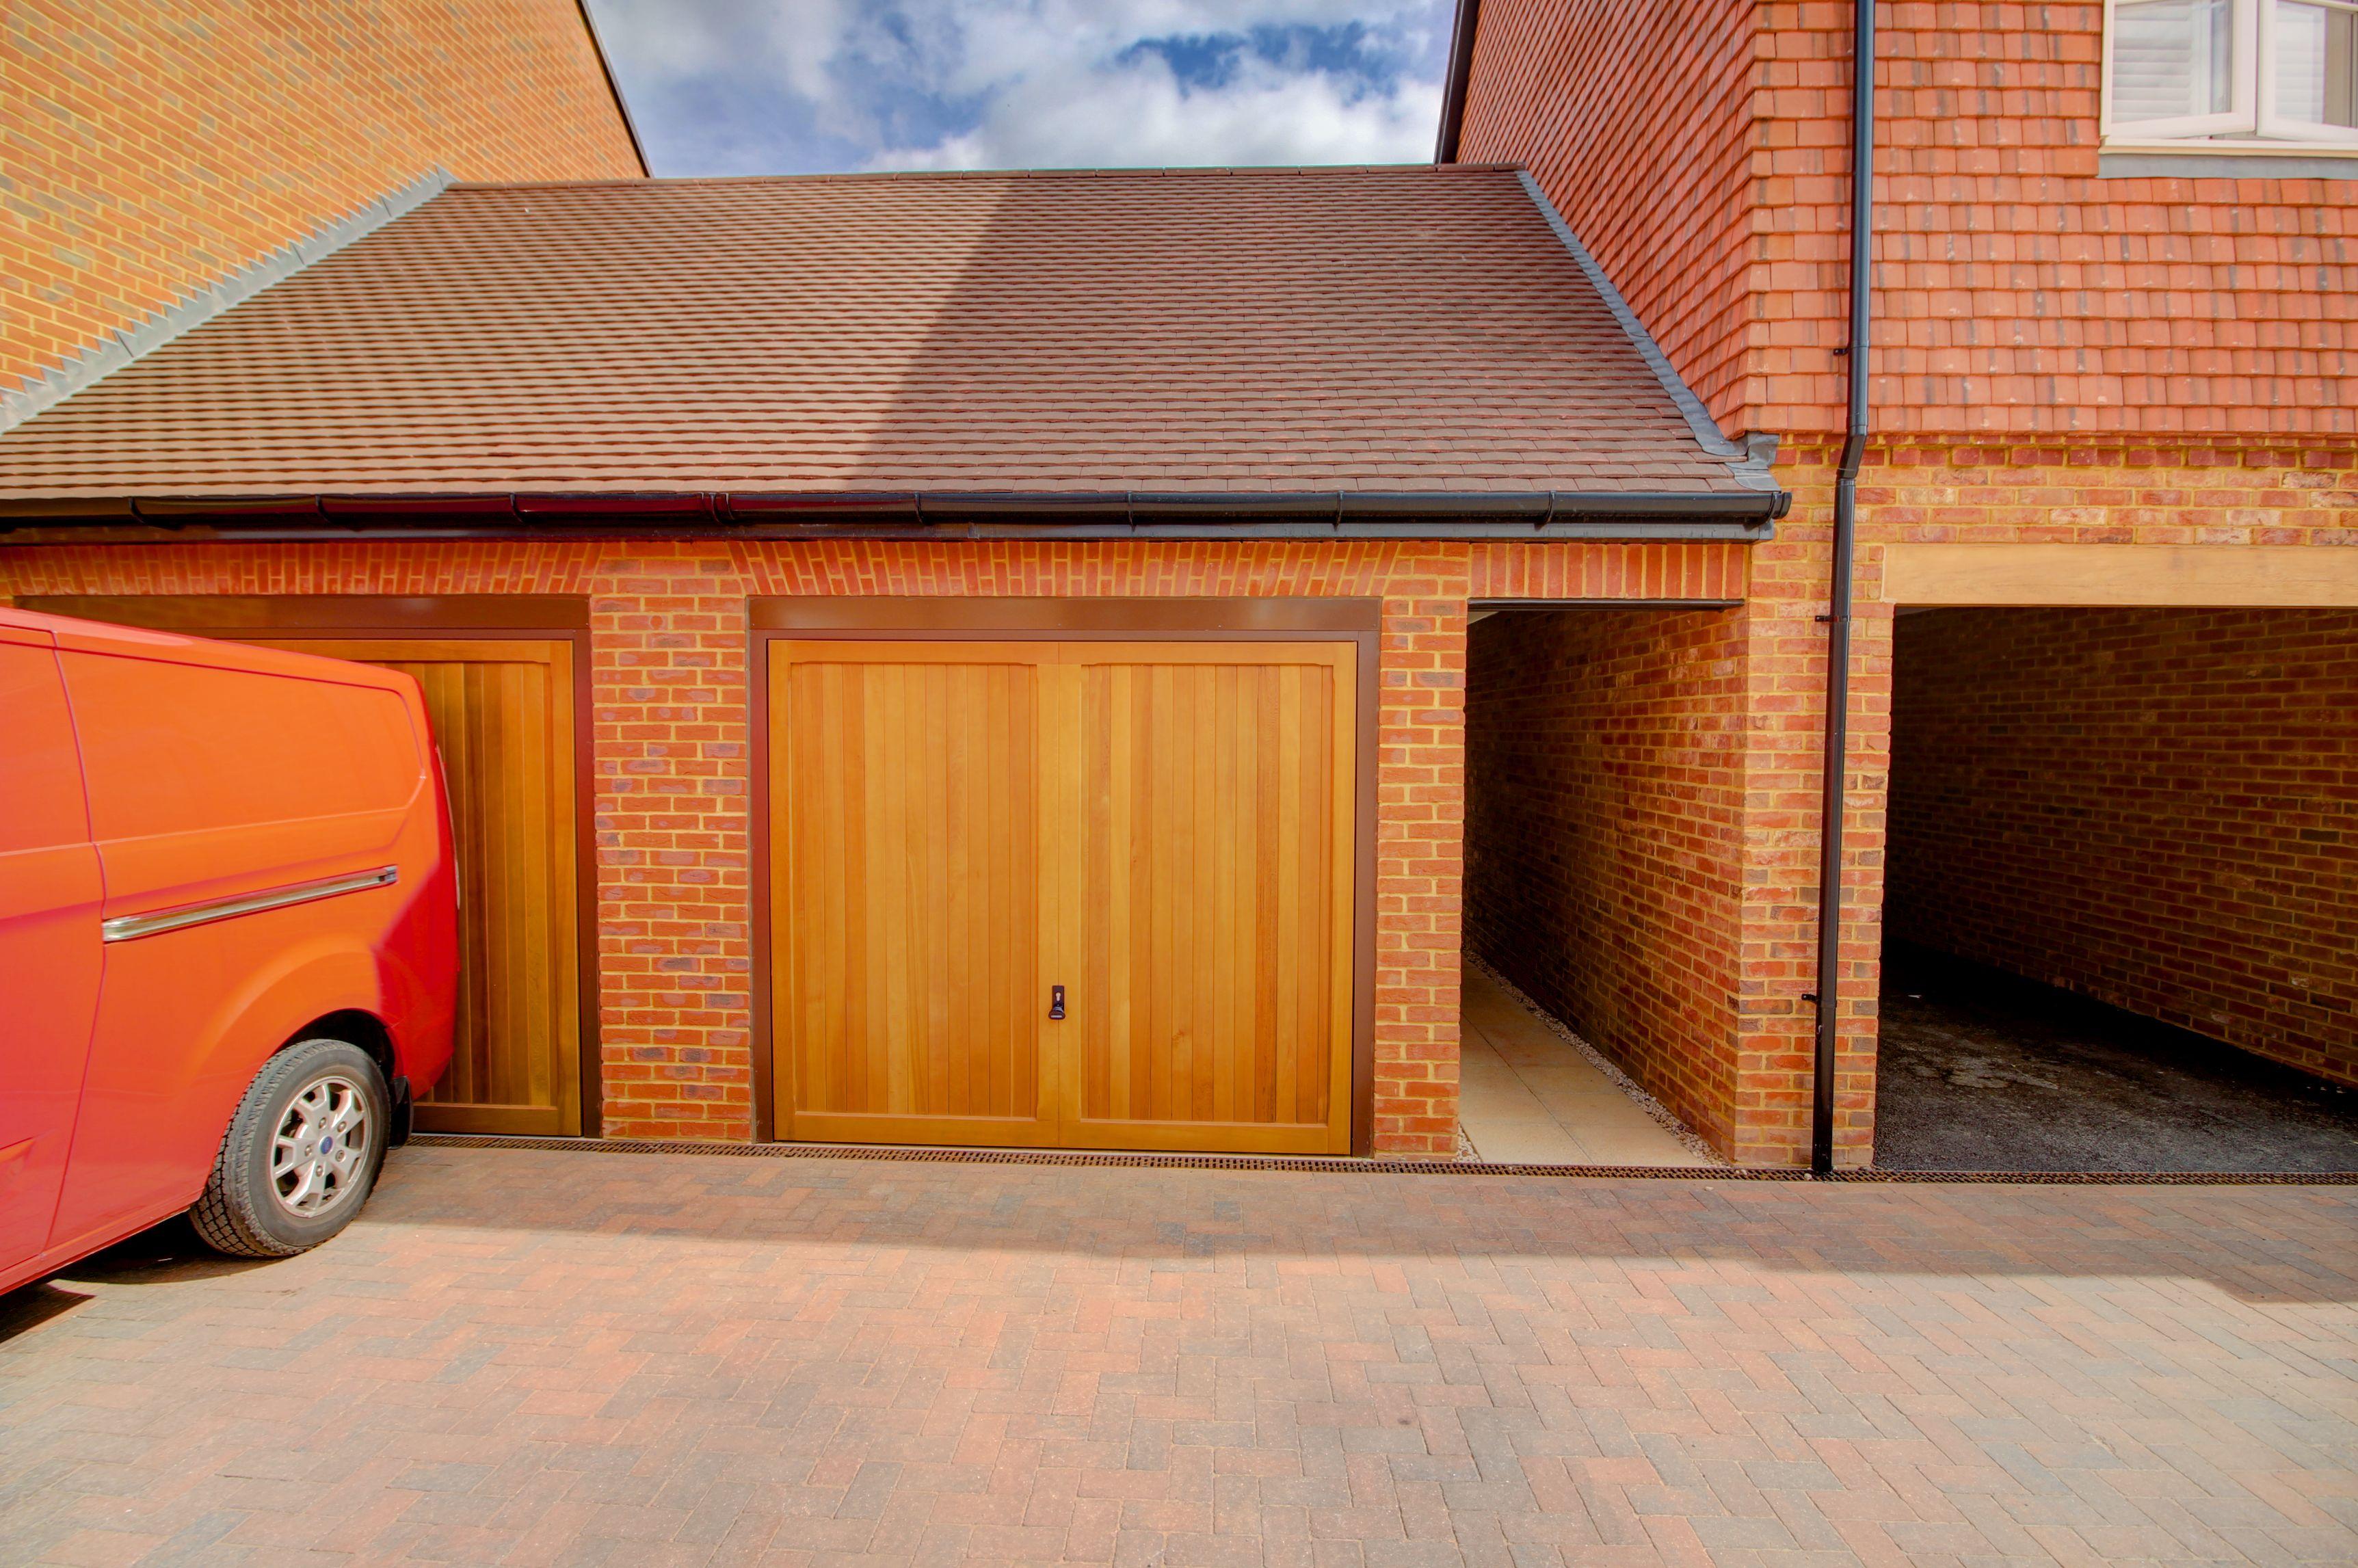 Woodhurst Park,Berkeley Homes,Drive,Parking,Garage